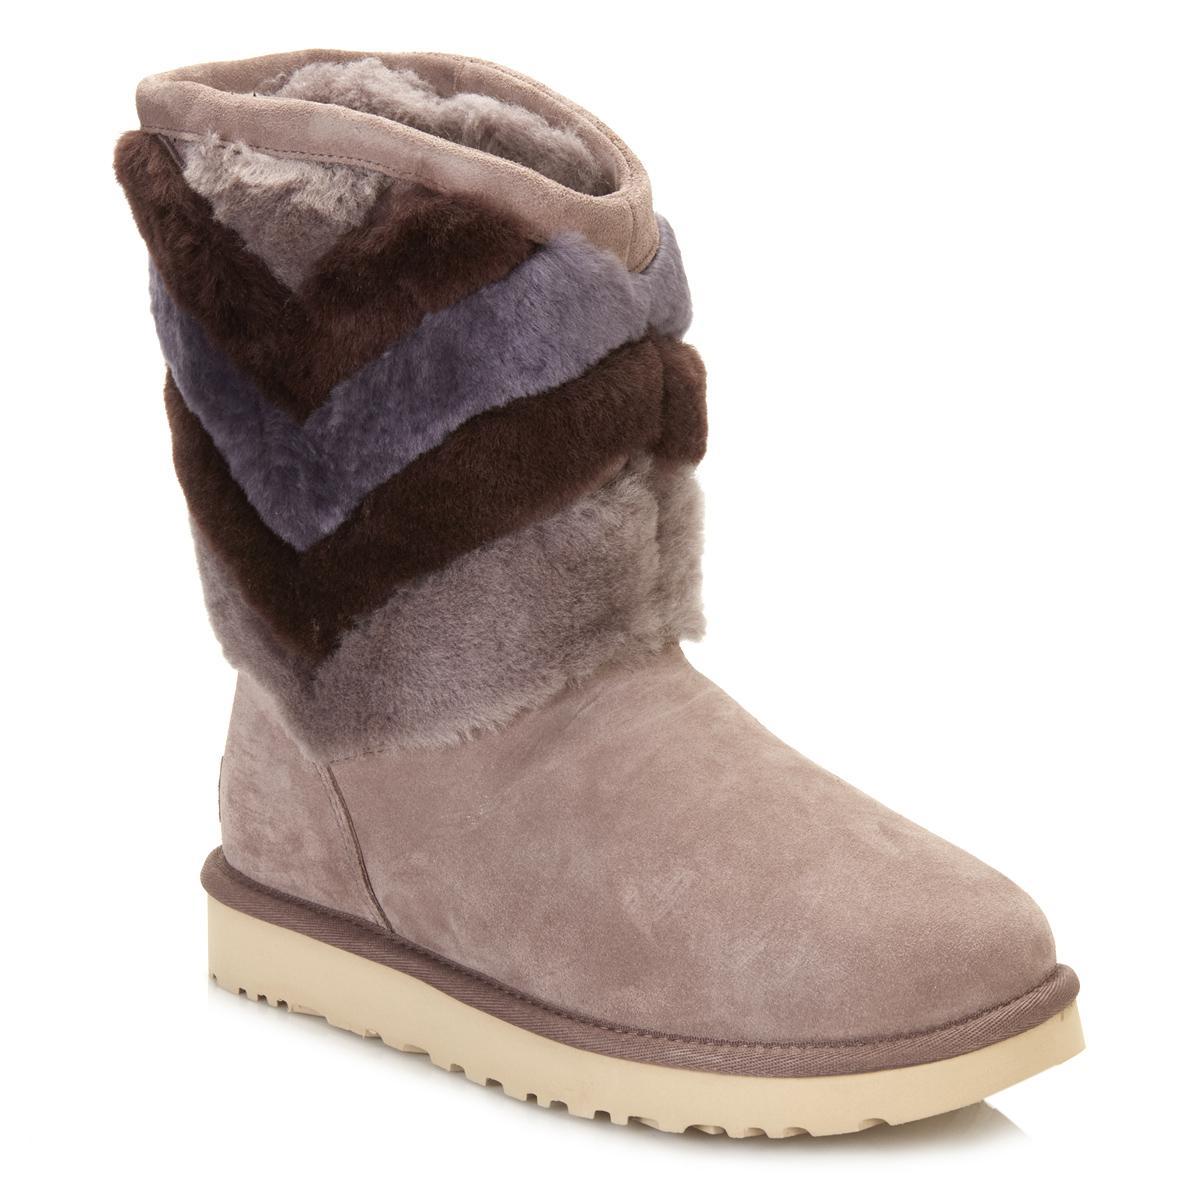 b2d8694966f Ugg Gray Ugg Womens Stormy Grey Tania Classic Novelty Sheepskin Boots